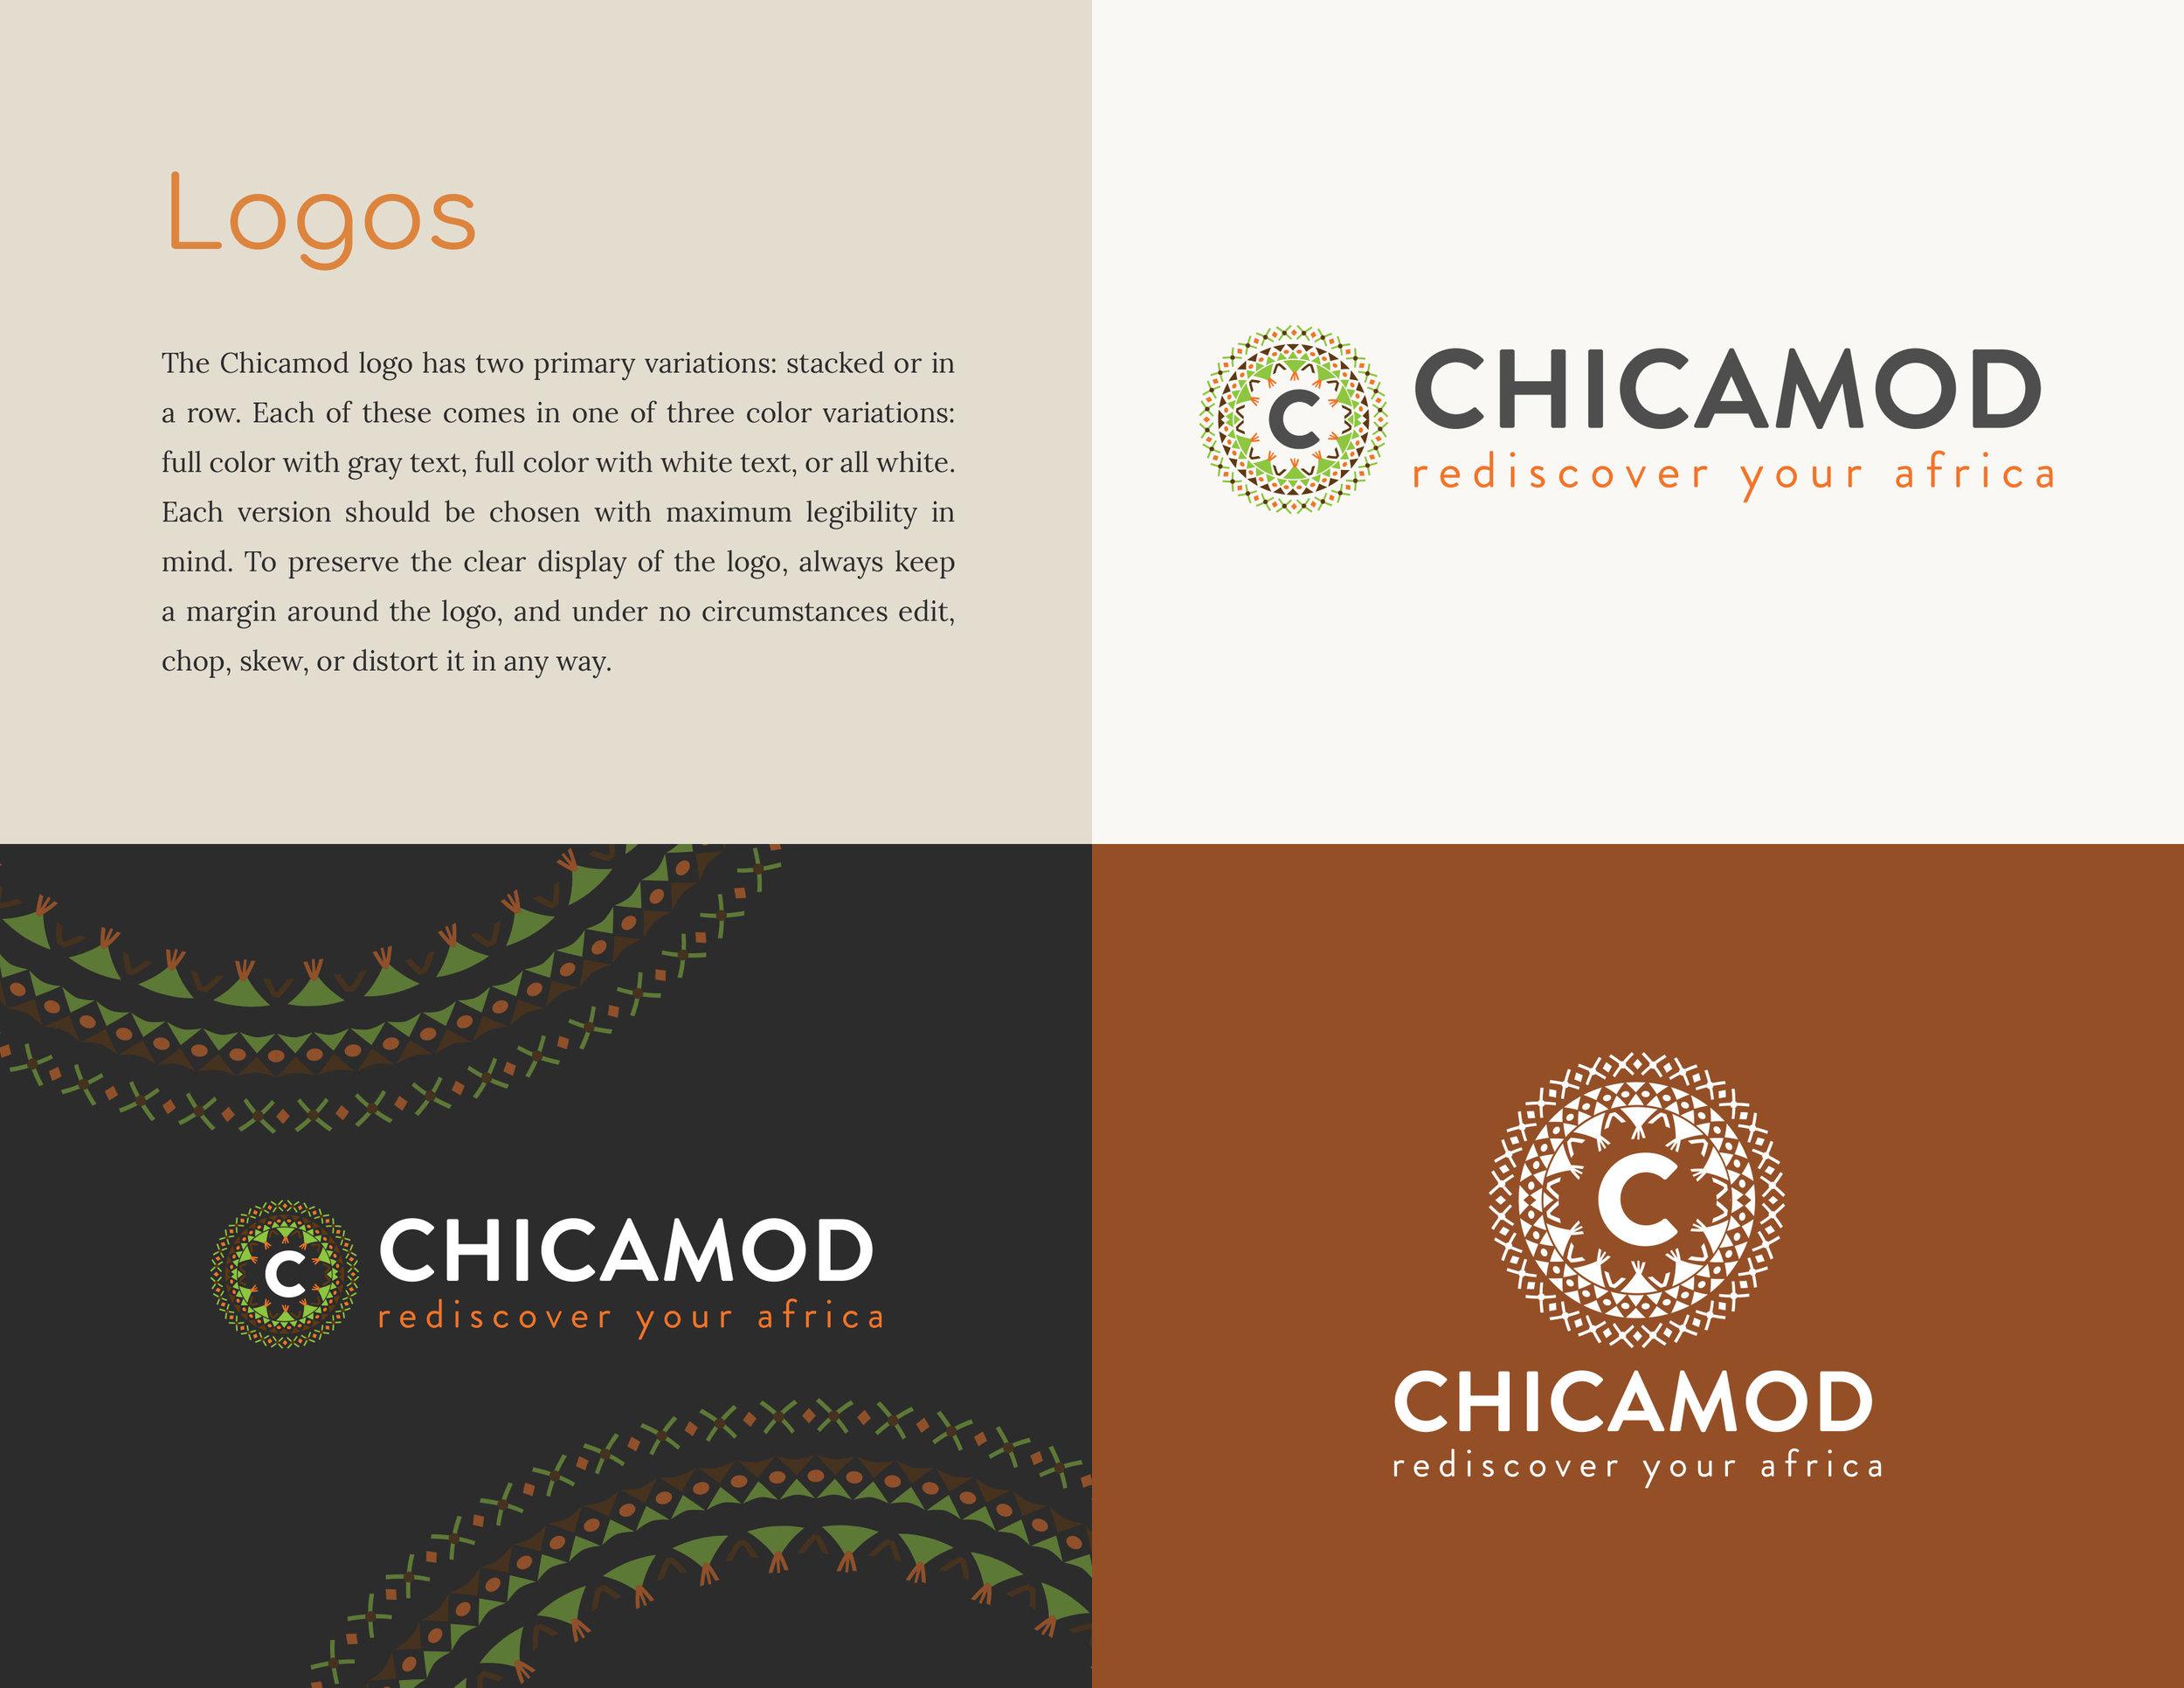 Chicamod-Brand-Guide-3.jpg